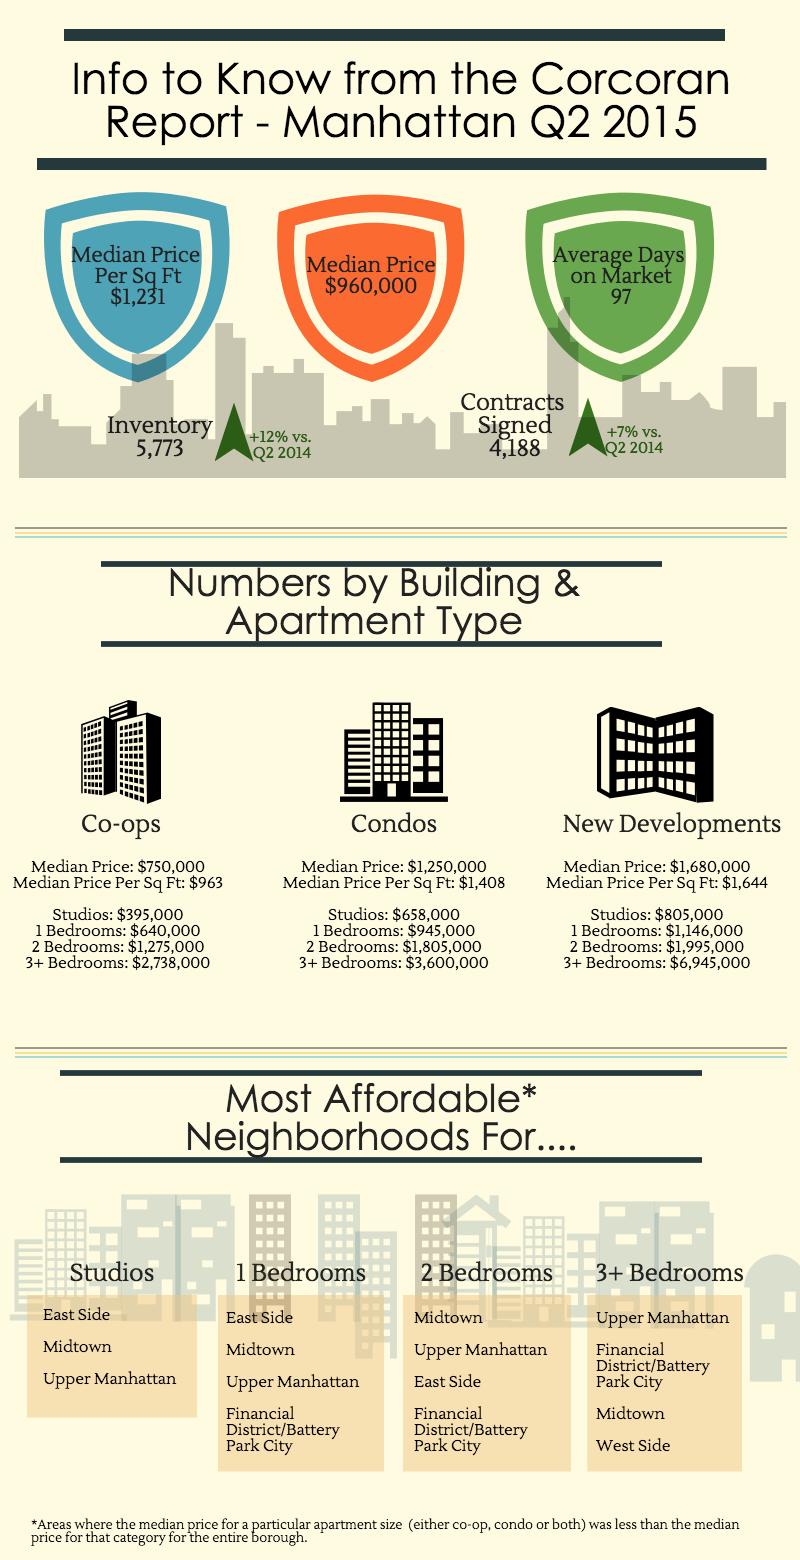 Manhattan Infographic Q2 2015 for Blog